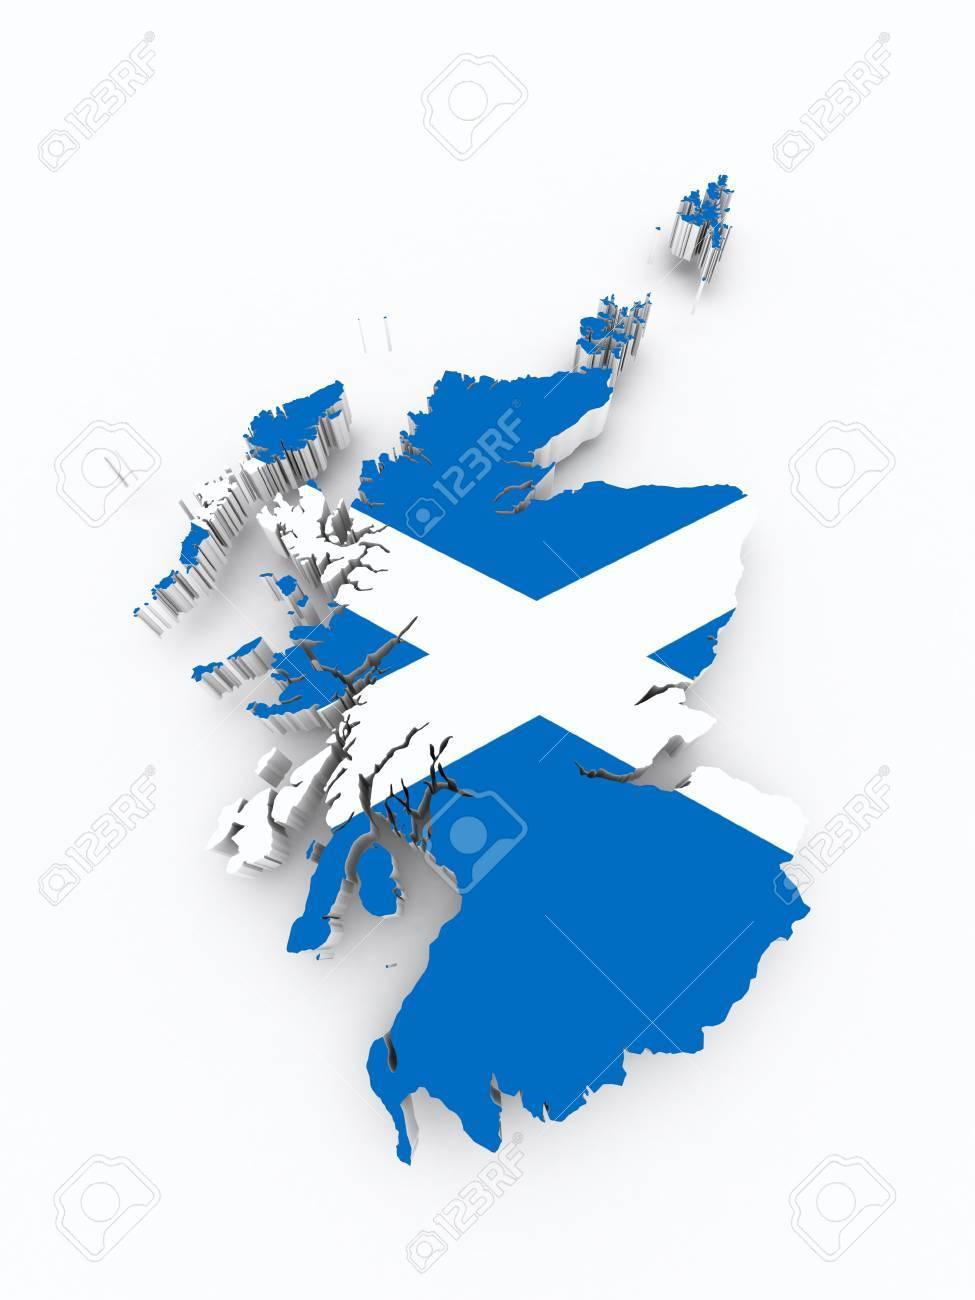 Scotland flag on 3d map on scotland x france, scotland map outline, island of islay scotland map, scotland map google, scotland county map, scotland shortbread recipe, scotland beach, scotland name map, scotland community, scotland on map, scotland map large, scotland lion, scotland travel map, silhouette scotland map, scotland football map, scotland tattoo, scotland road map,